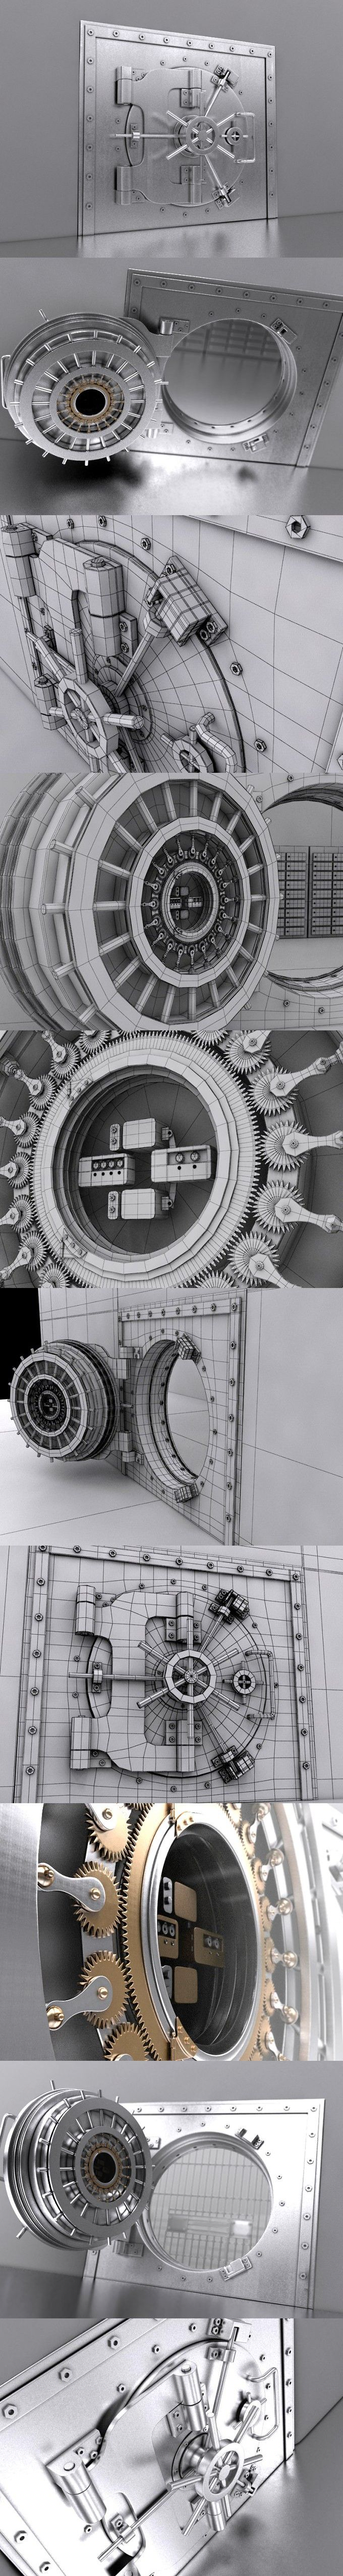 Bank Safe Vault. 3D Objects